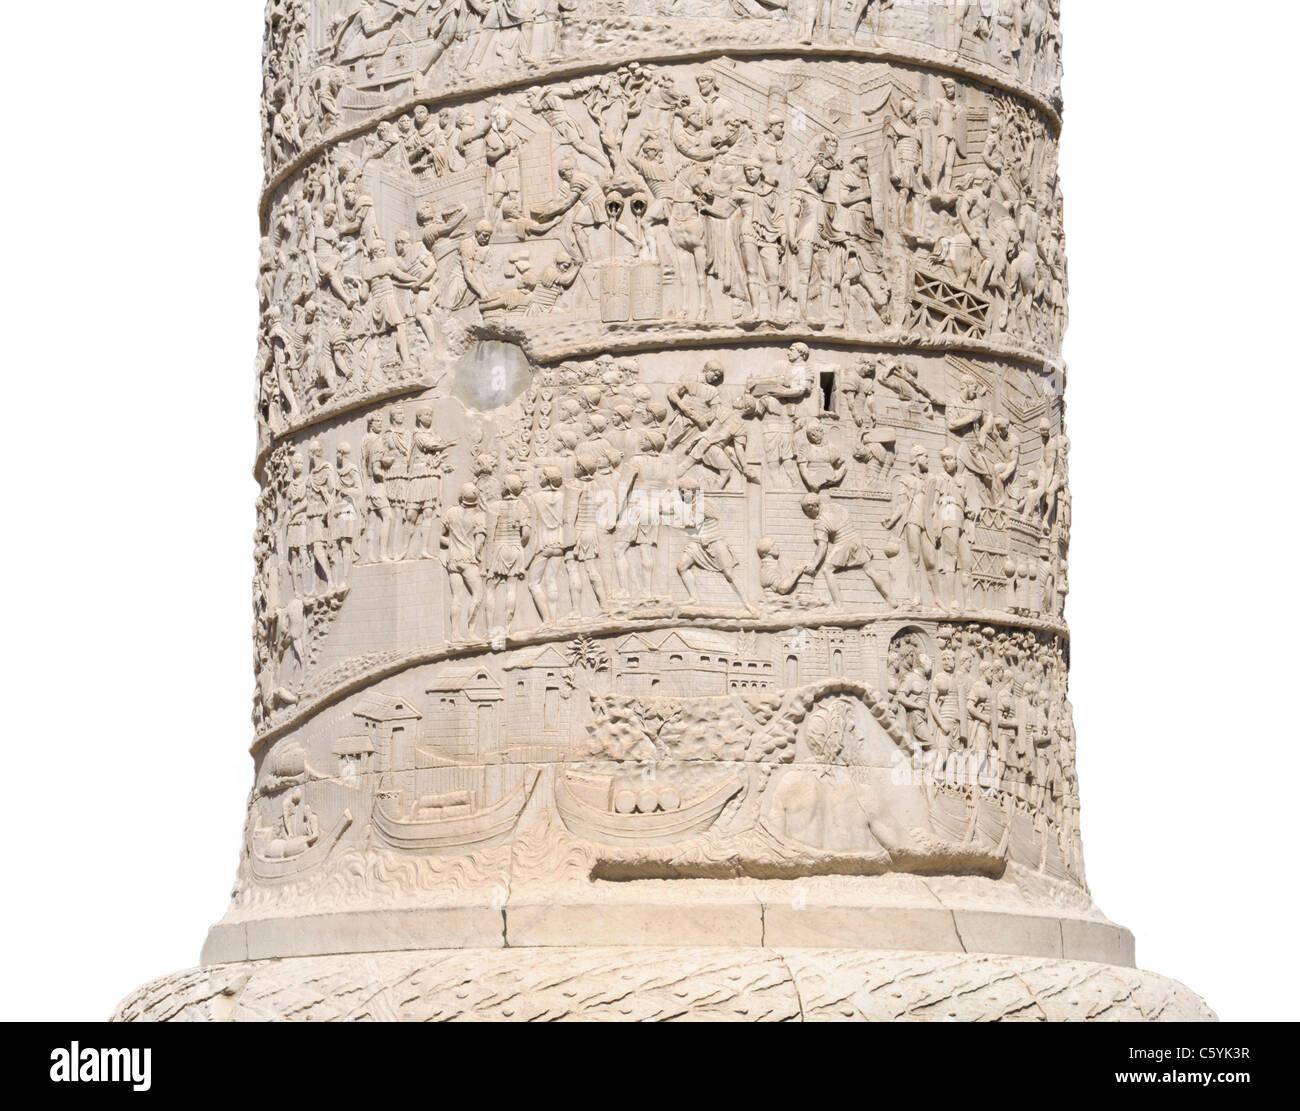 La Columna de Trajano (Colonna Traiana) Detalle, Roma Imagen De Stock